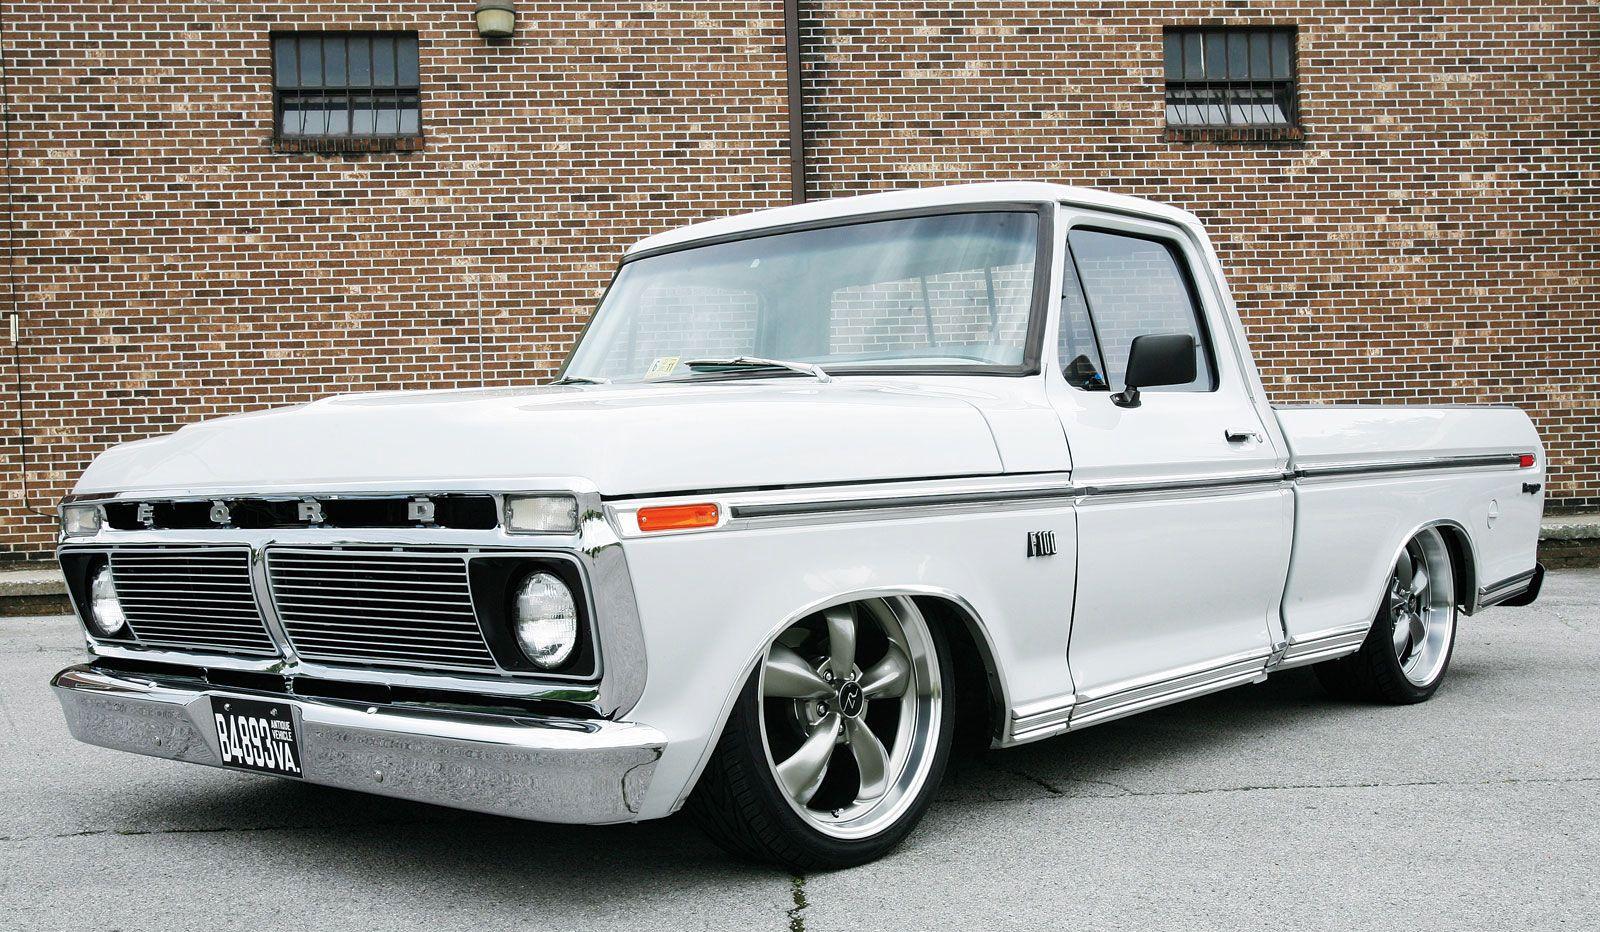 1974 ford f 100 ranger pickup truck by vertualissimo on deviantart